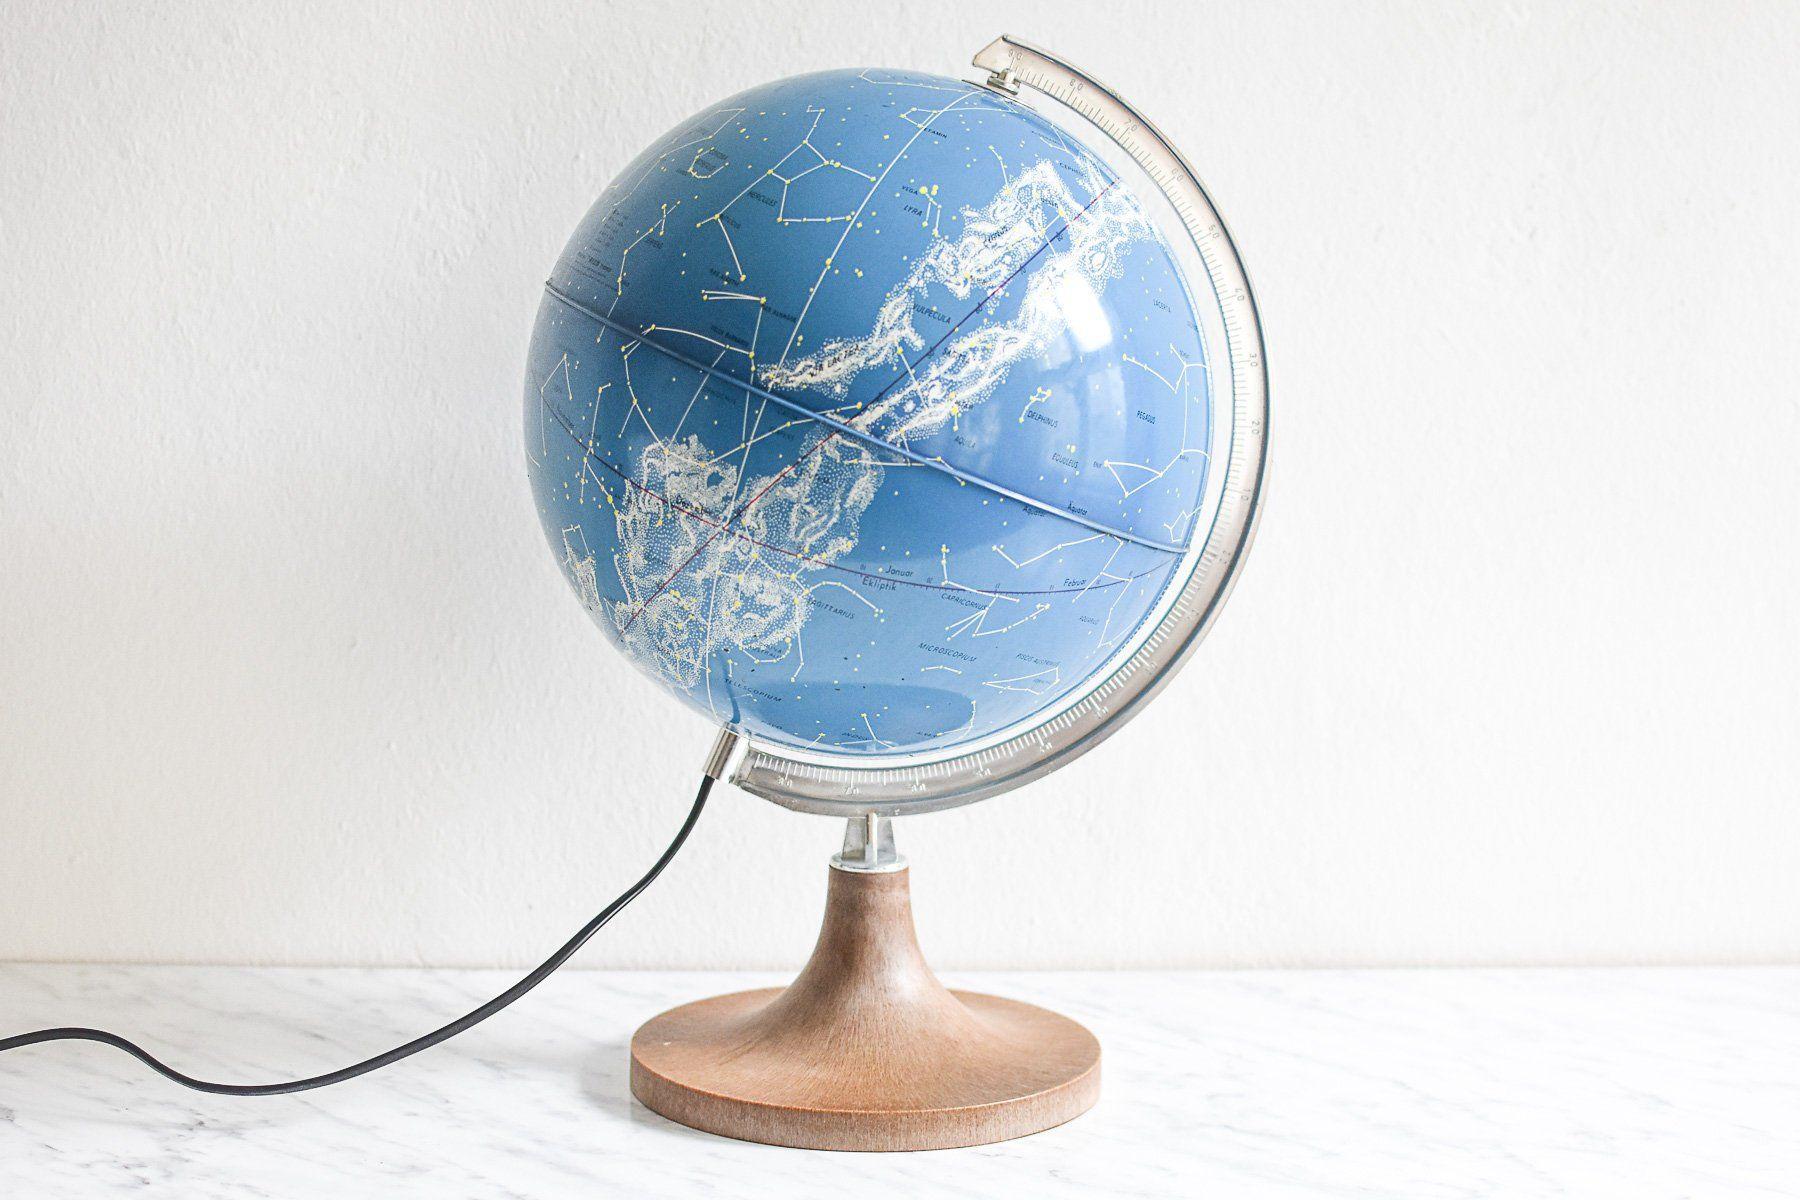 Globus Weltkugel Karte.Himmelsglobus Astronomie Globus Sternenkarte Konstellationen